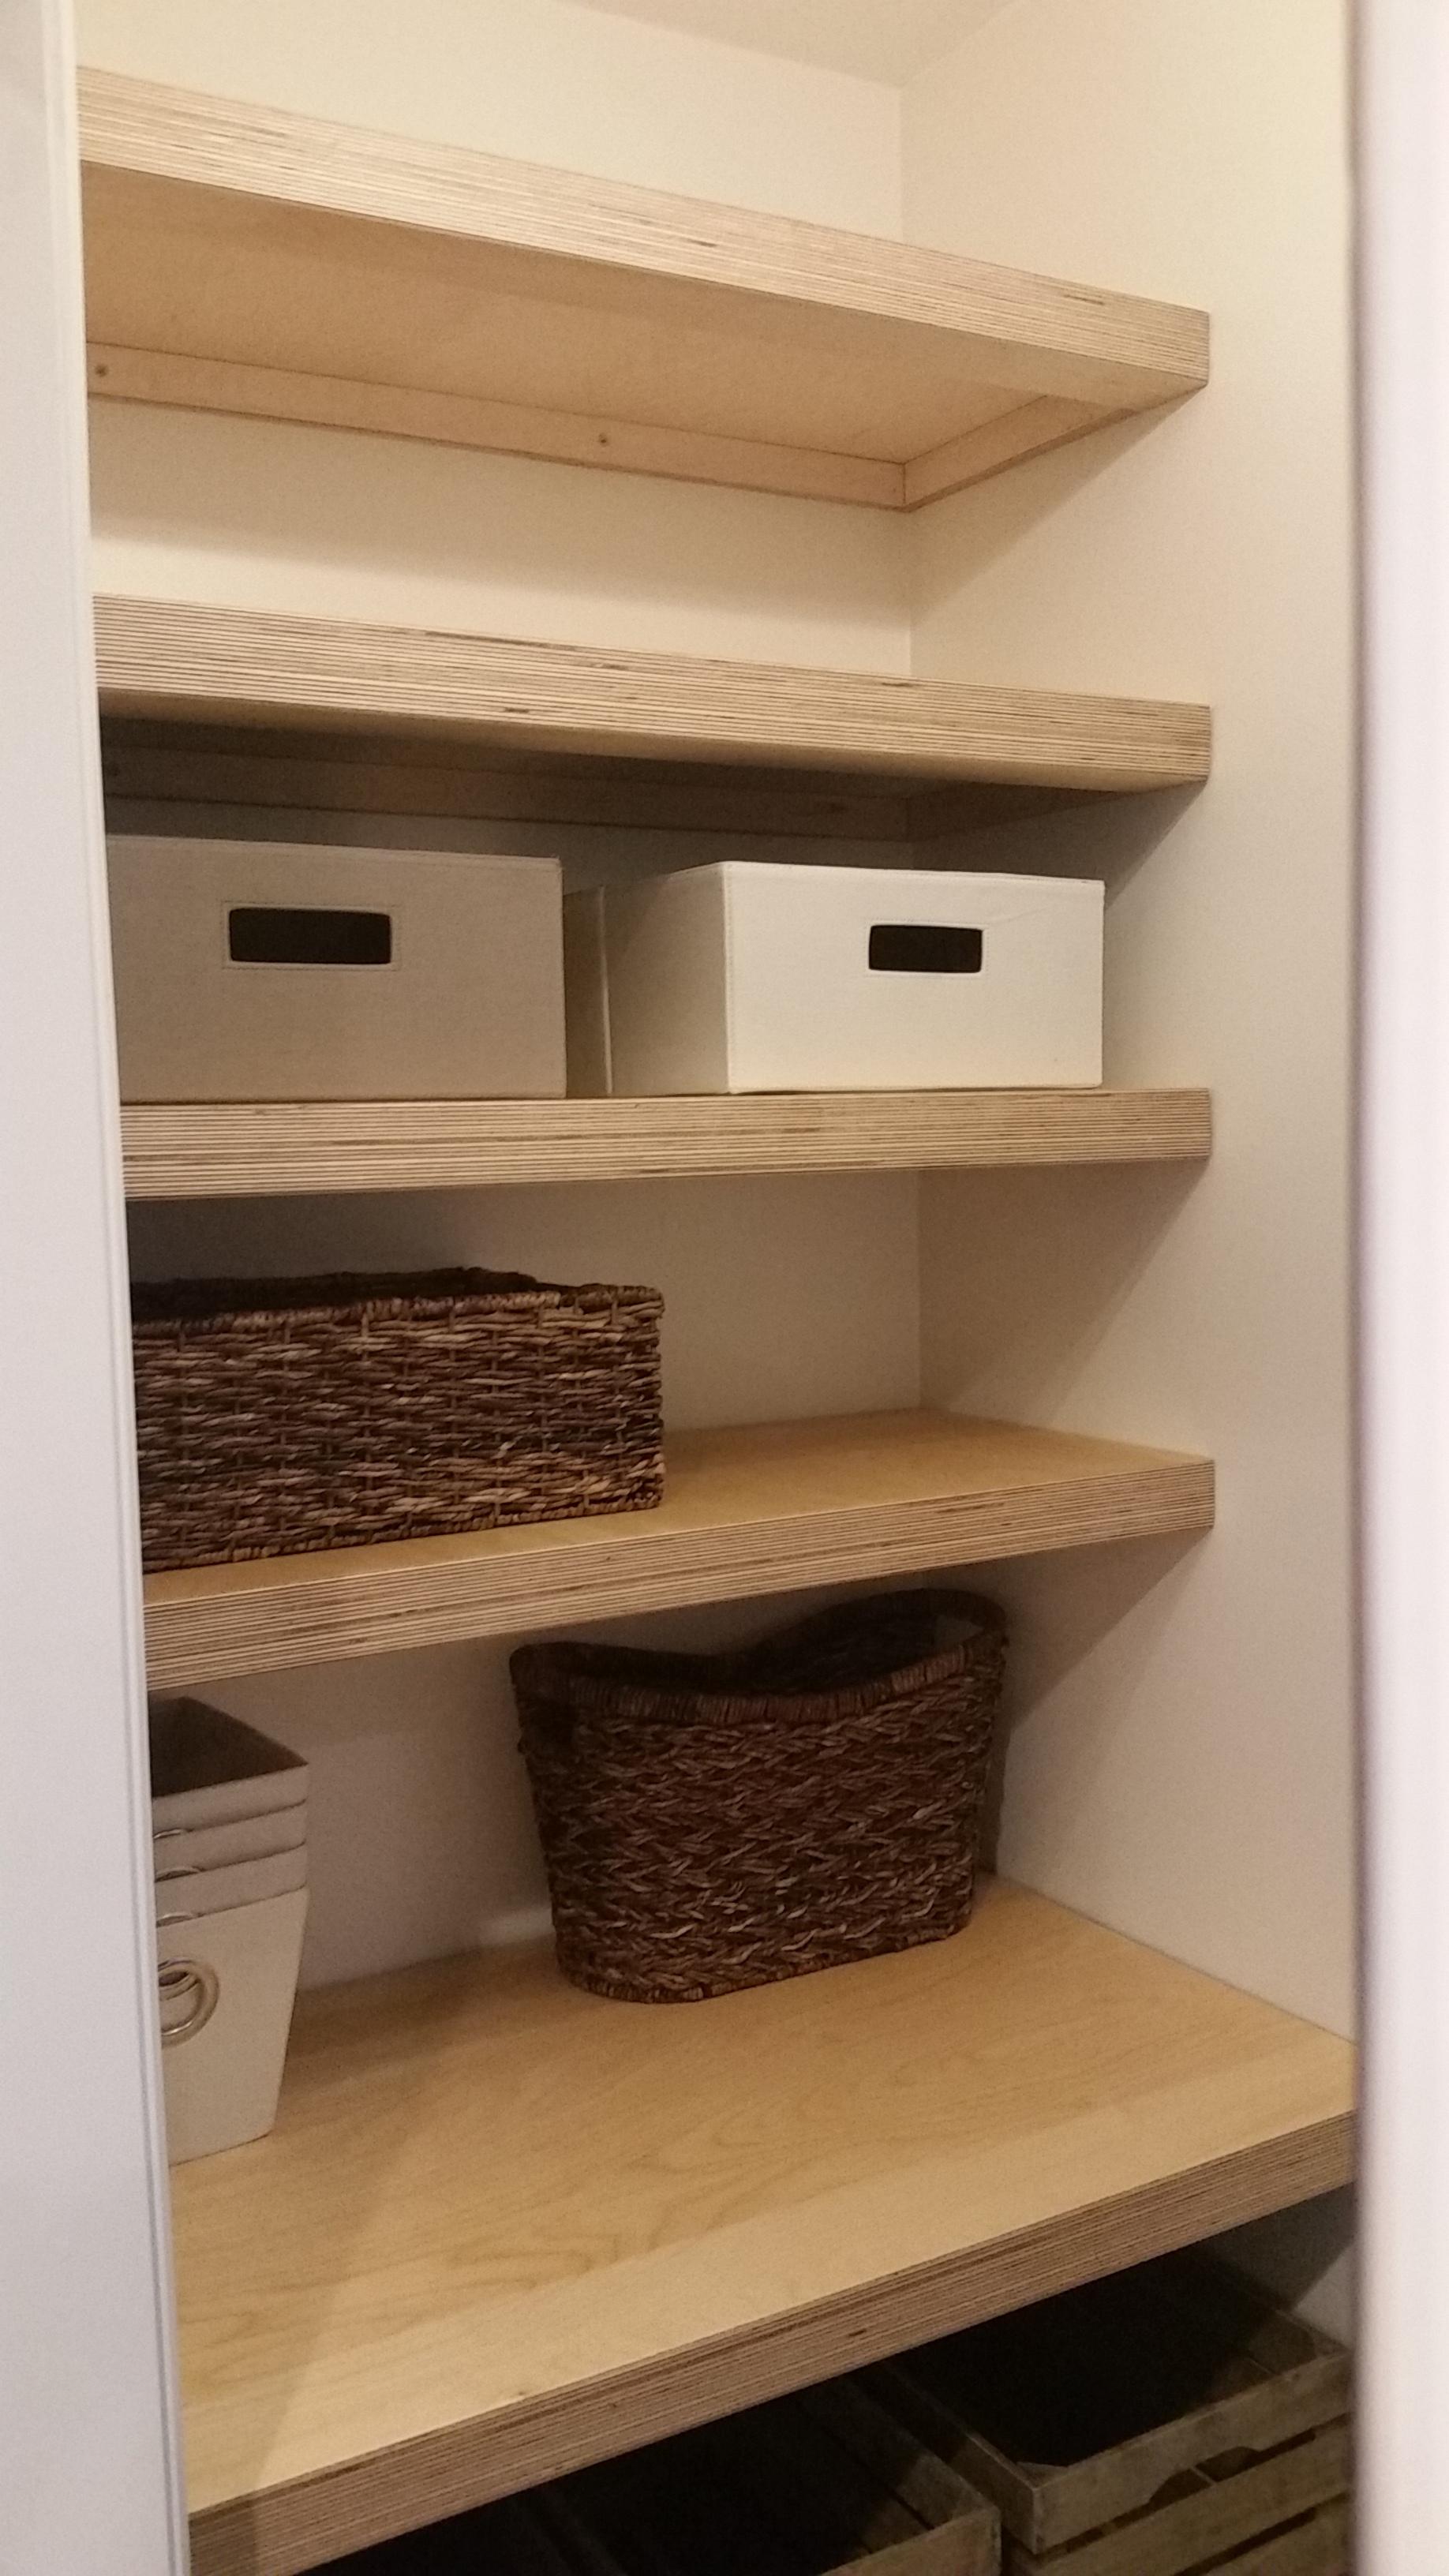 Built in Birch plywood shelves